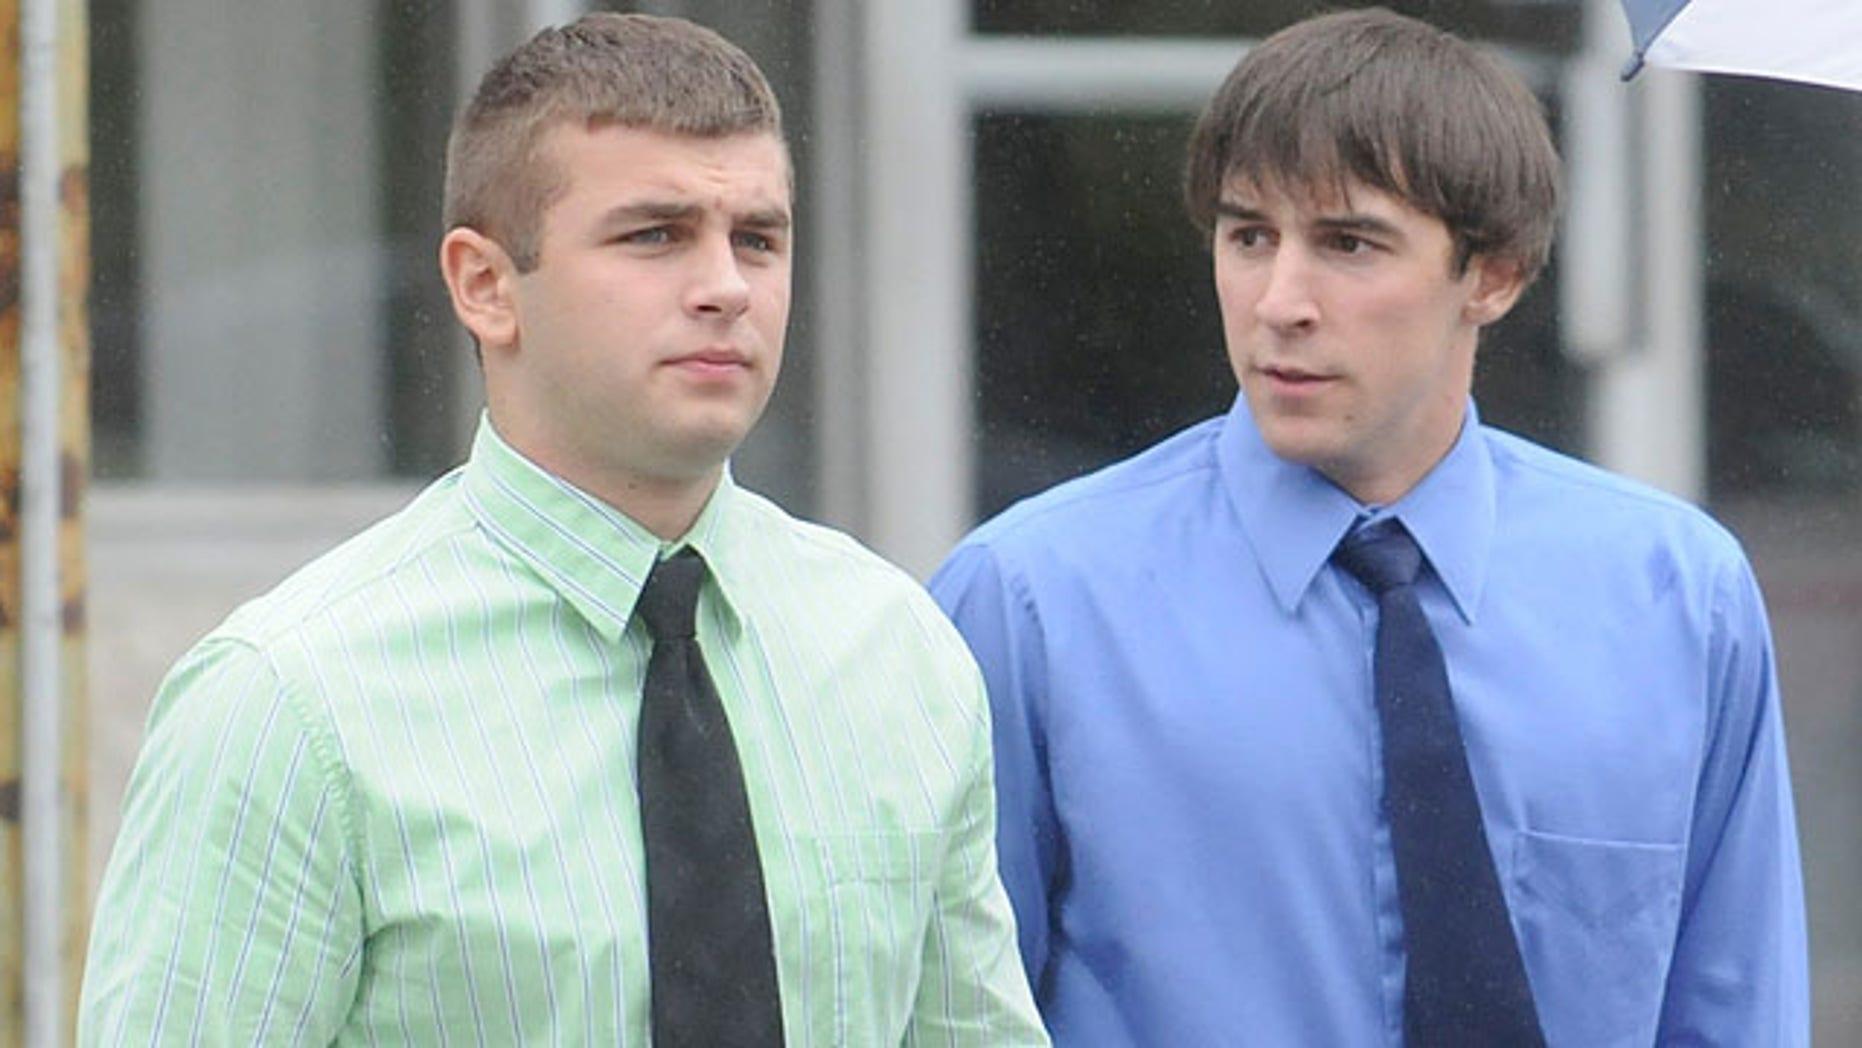 Oct. 4, 2010: Brandon J. Piekarsky, 18, of Shenandoah Heights, left, and Derrick M. Donchak, 20, of Shenandoah, return to the William J. Nealon Federal Building and United States Courthouse in Scranton, Pa.